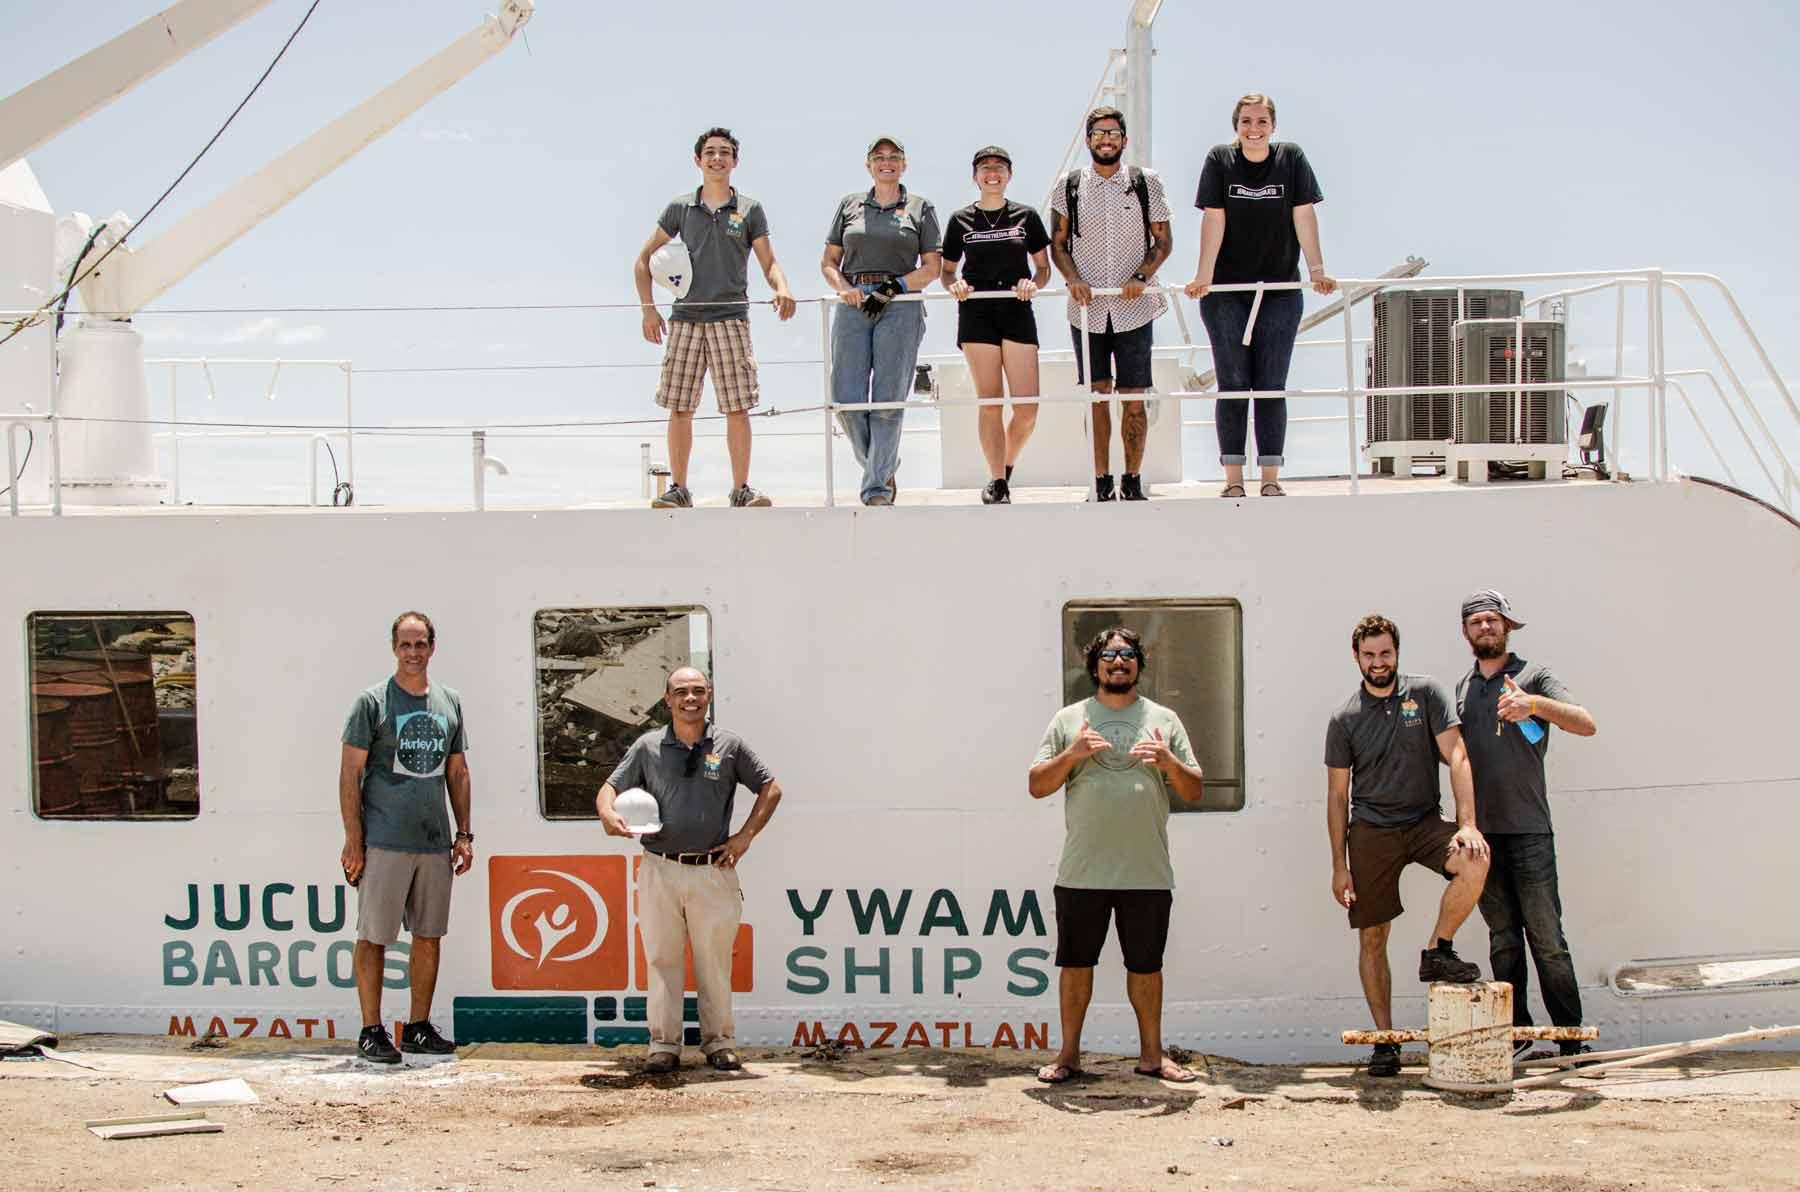 YWAM Ships Mazatlan Family